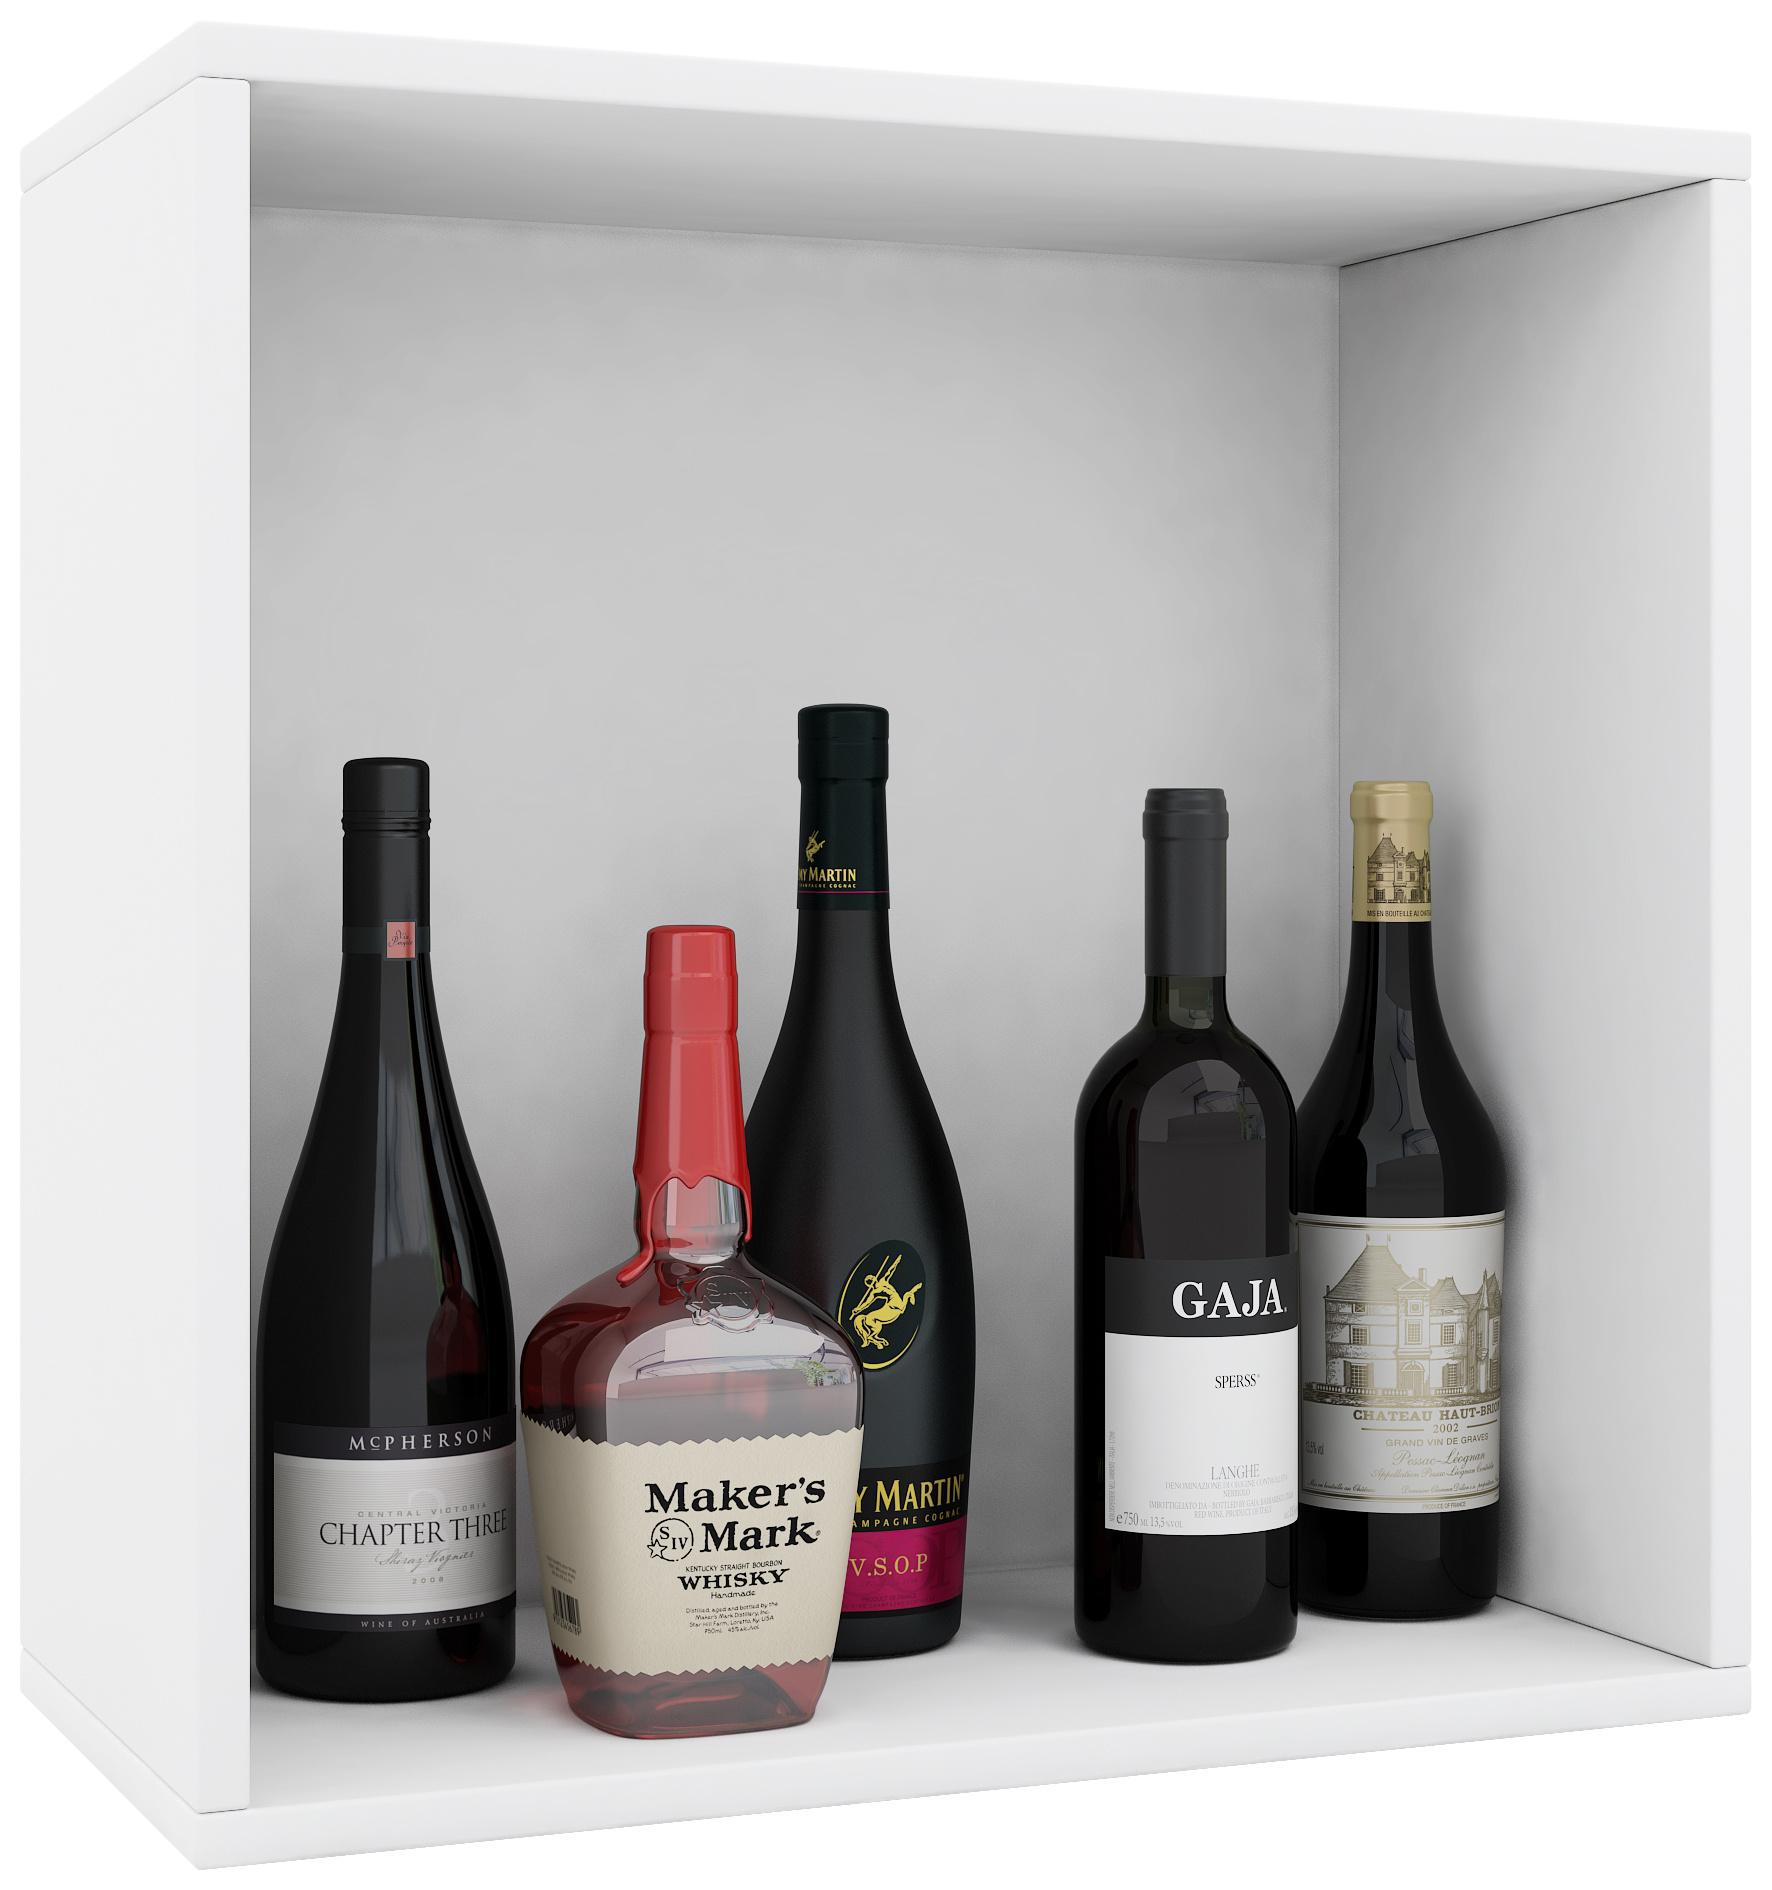 Vcm Wein Regalserie Regal Weinregal Weinschrank Weinflaschen Schrank Holz Wurfel Flaschen Aufbewahrung Weino Vcm Weinregal Serie Weino Farbe Weino L Weiss Weltbild De